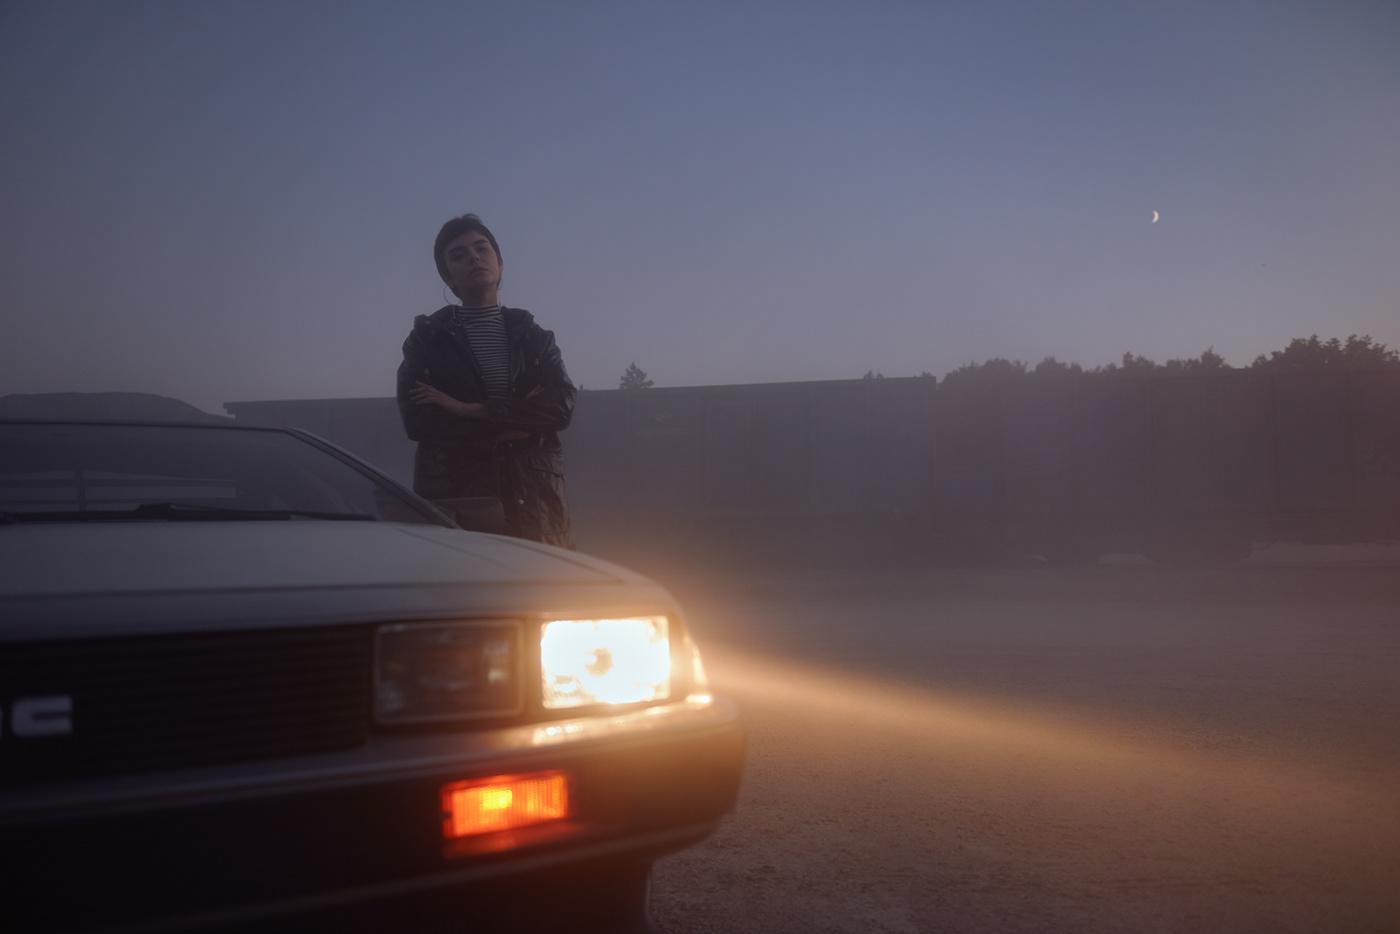 automotive  ,car,DeLorean,Scifi,back to the,future,DAWN,science fiction,blue hour,classic car